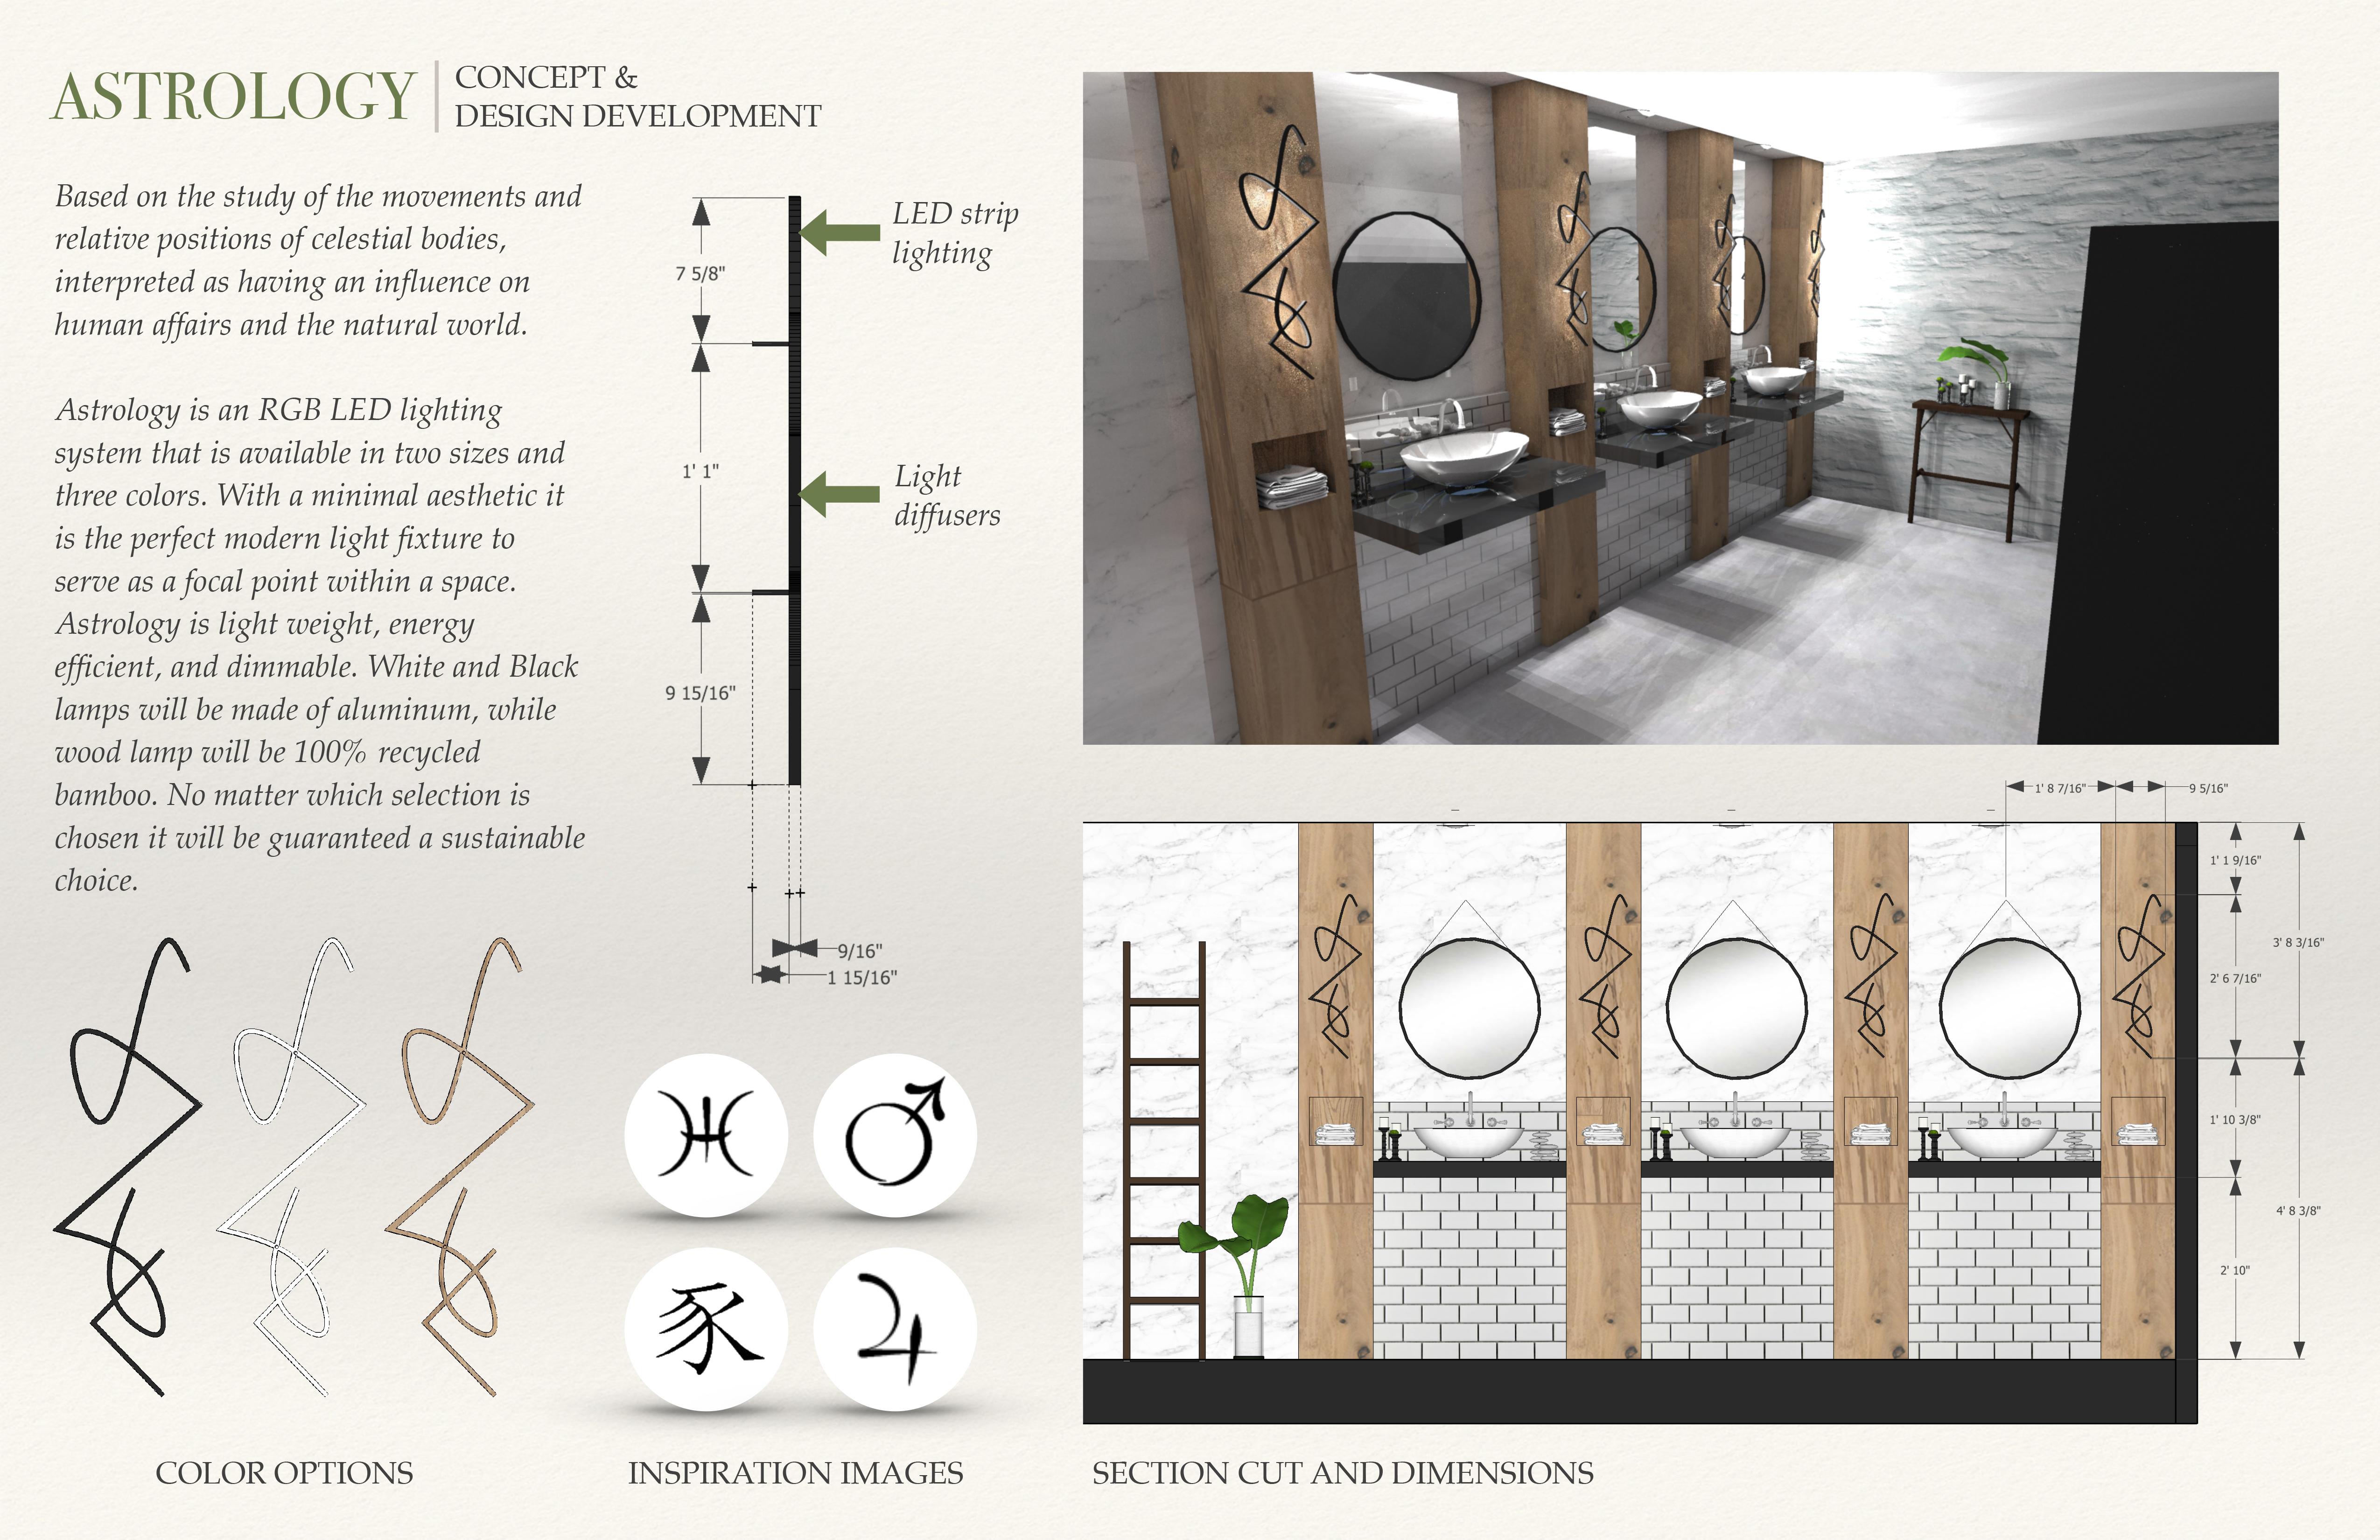 Excellent Board Astrology Light Fixture Concept U Design Development With Interior Statement